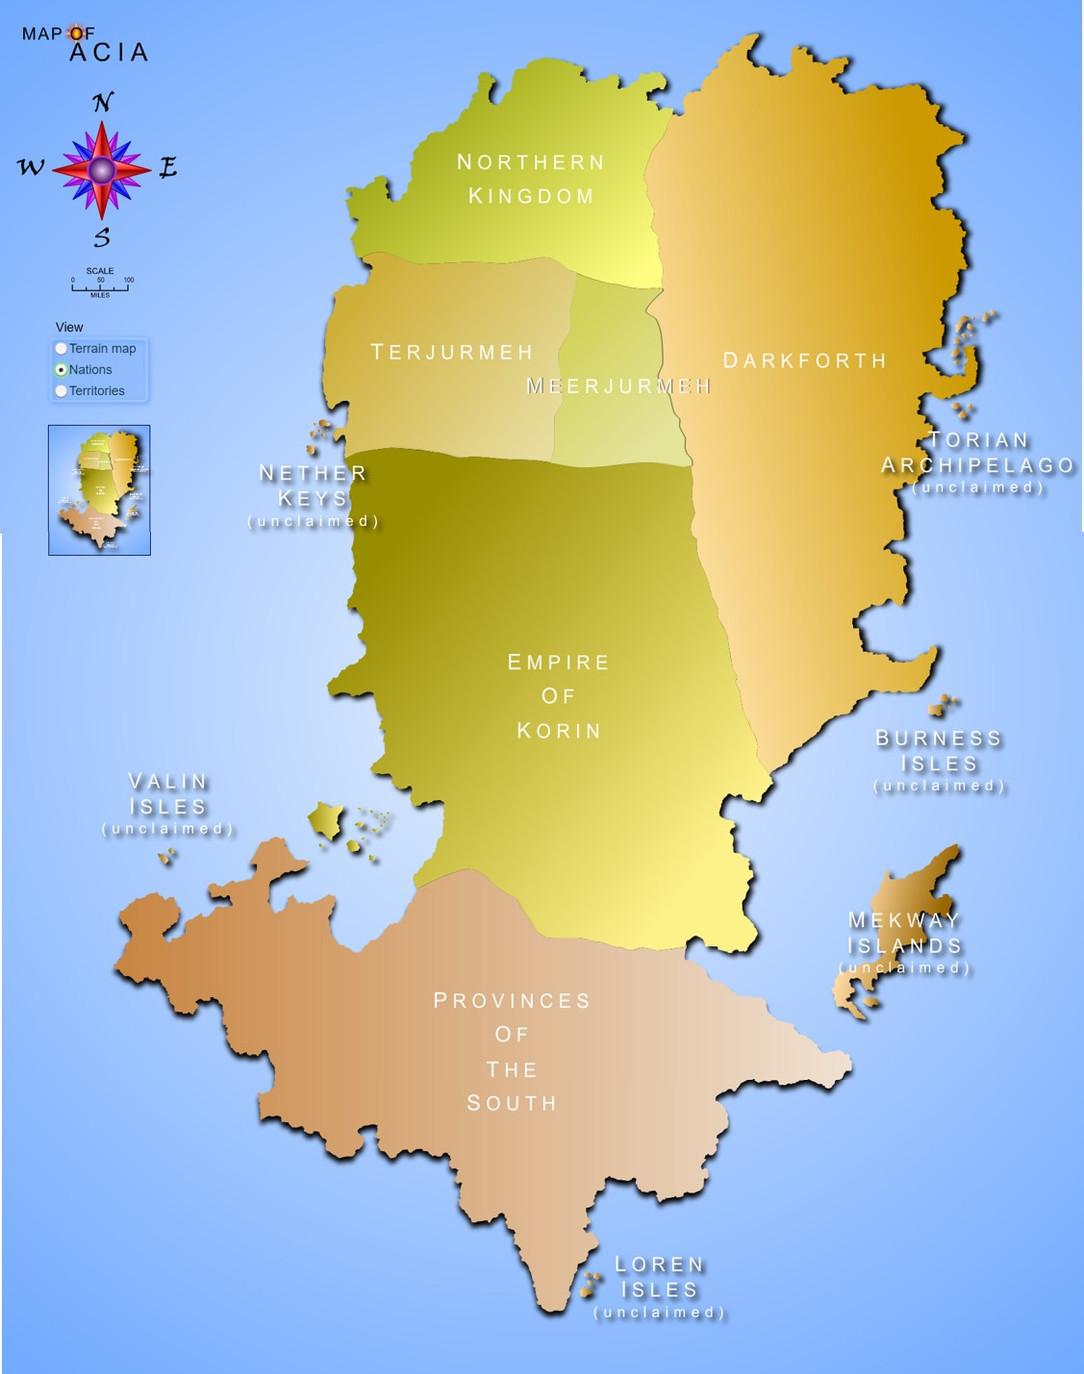 Map of Acia - Nations